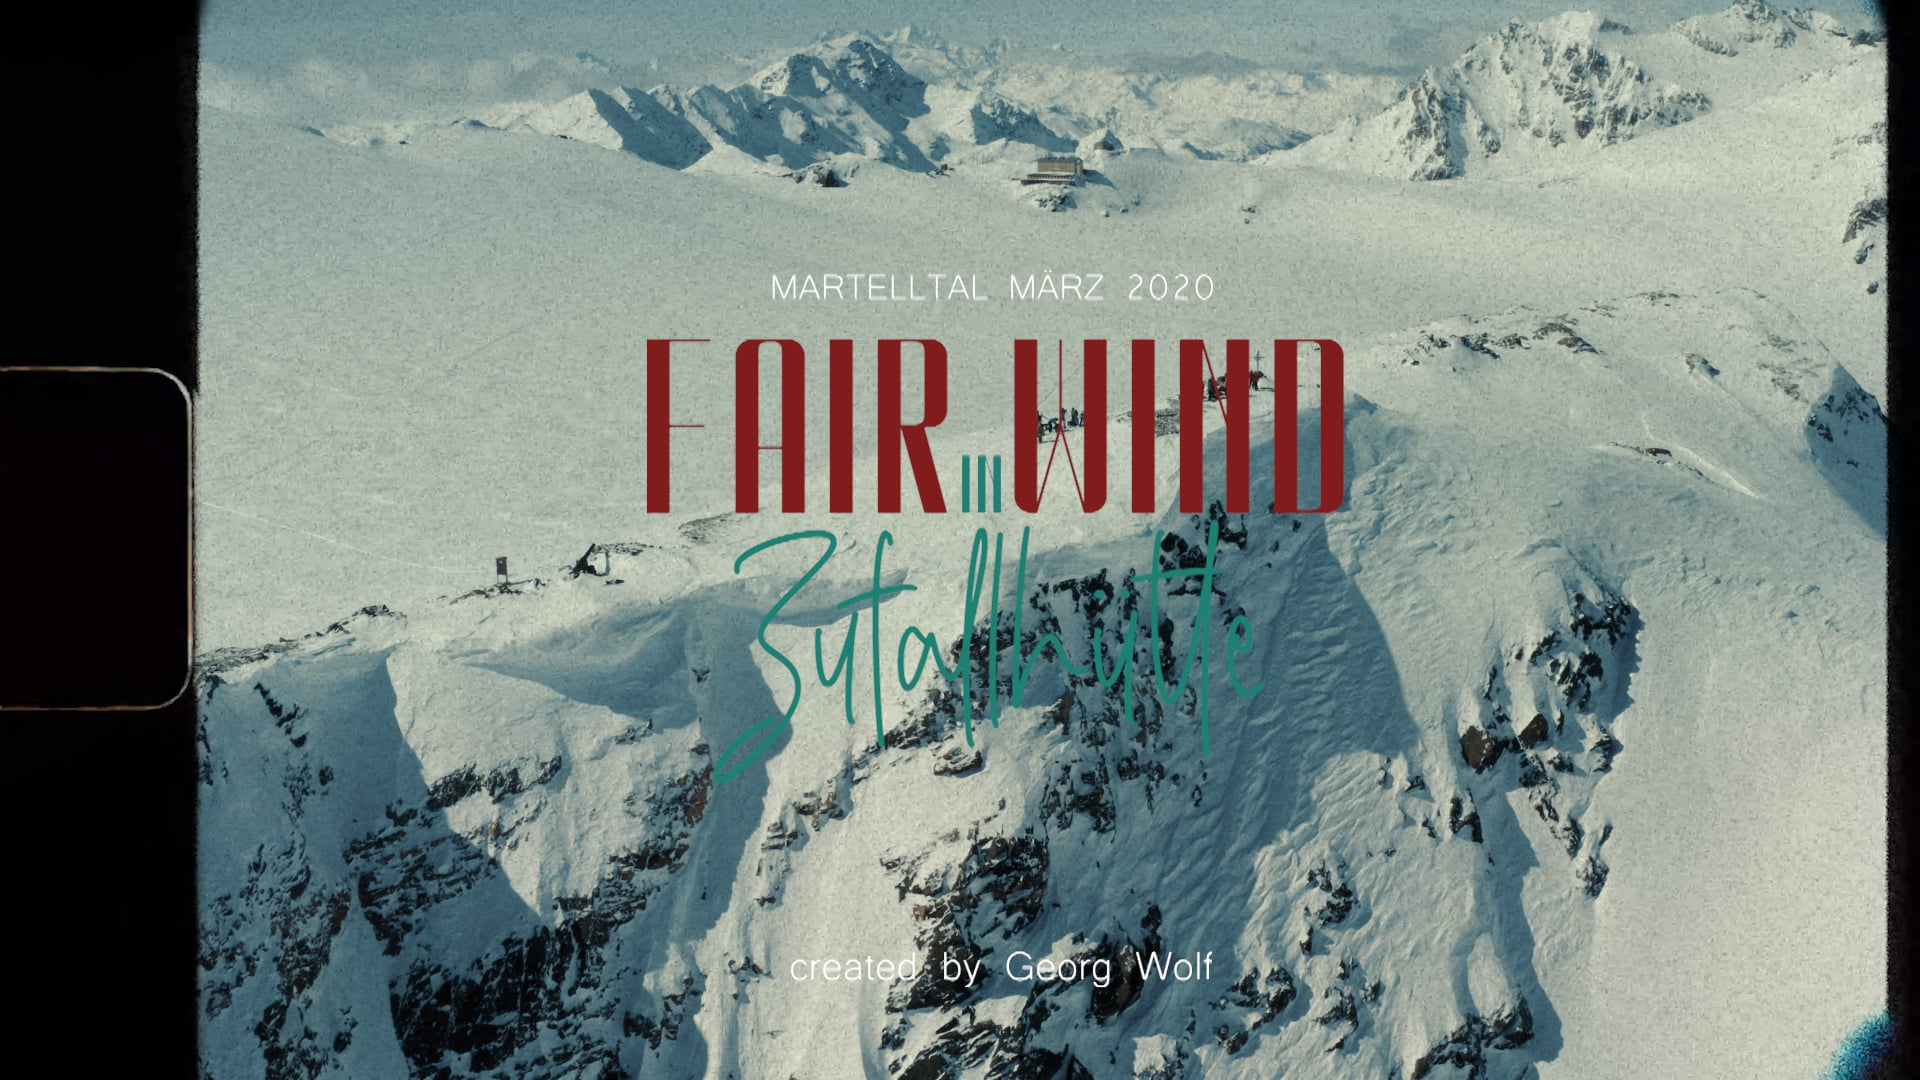 FAIR WIND in Zufallhütte Martelltall Südtirol Italia